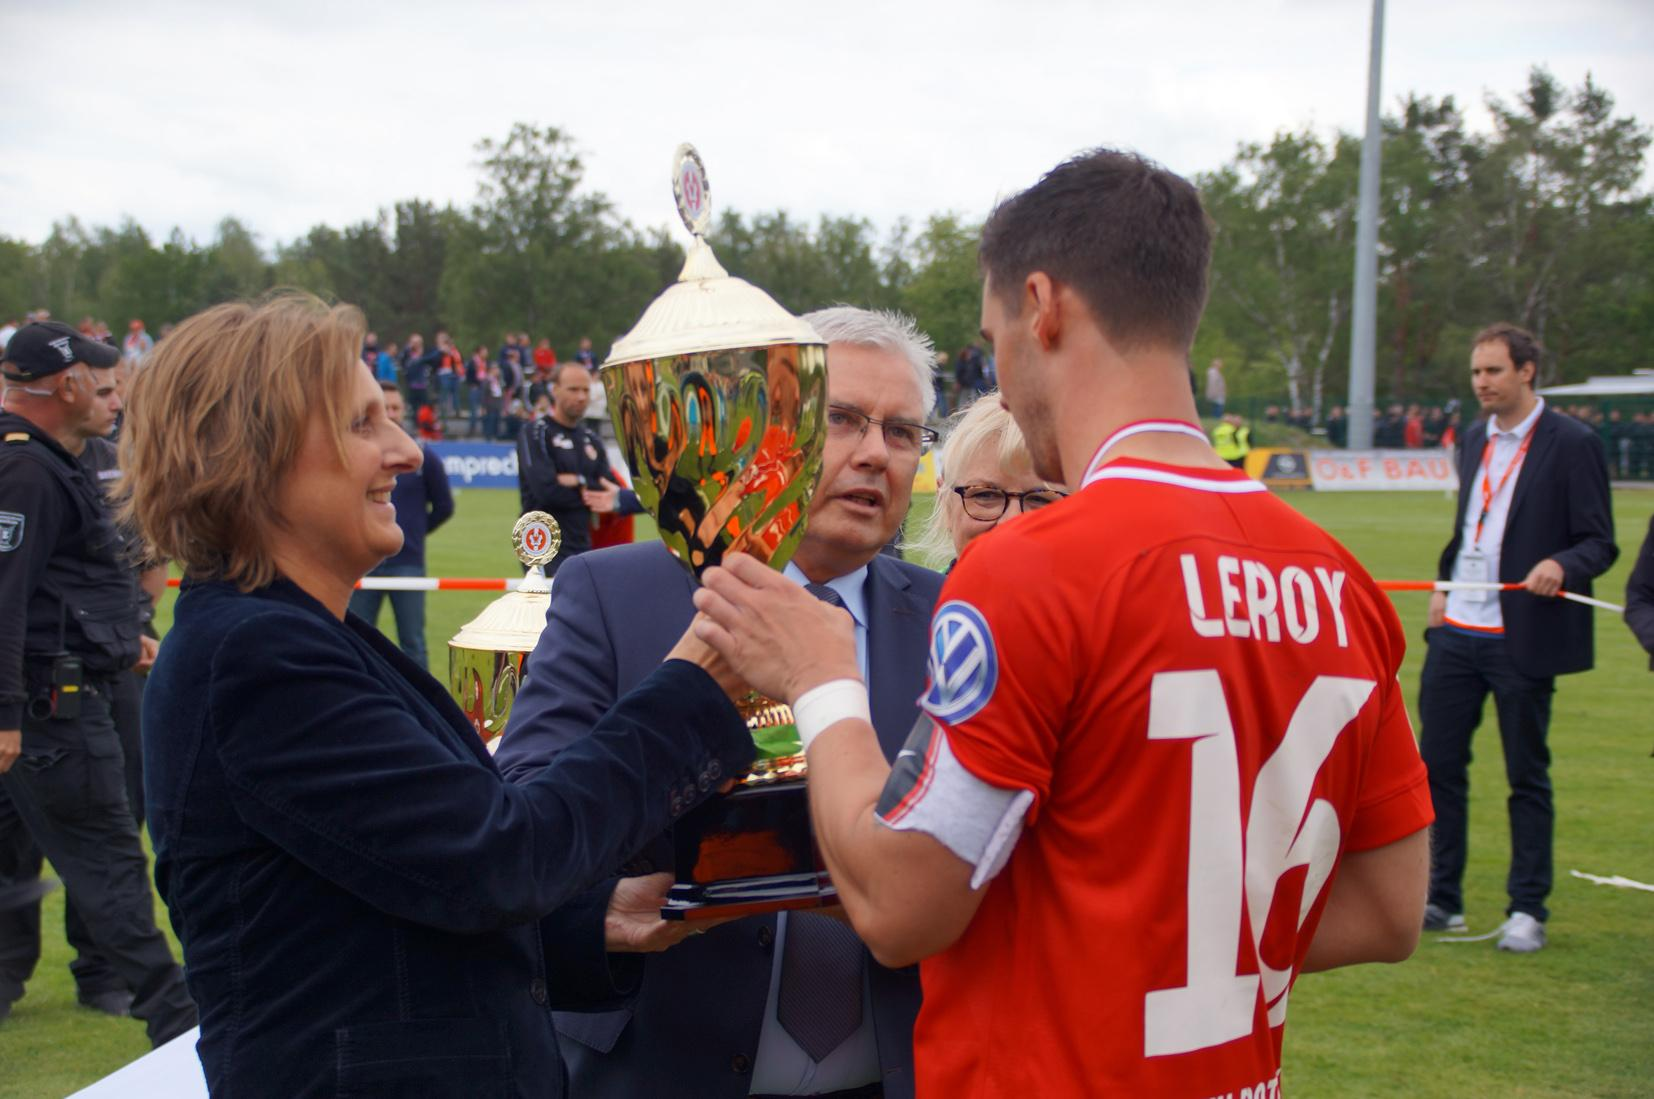 Landespokal 2018/19